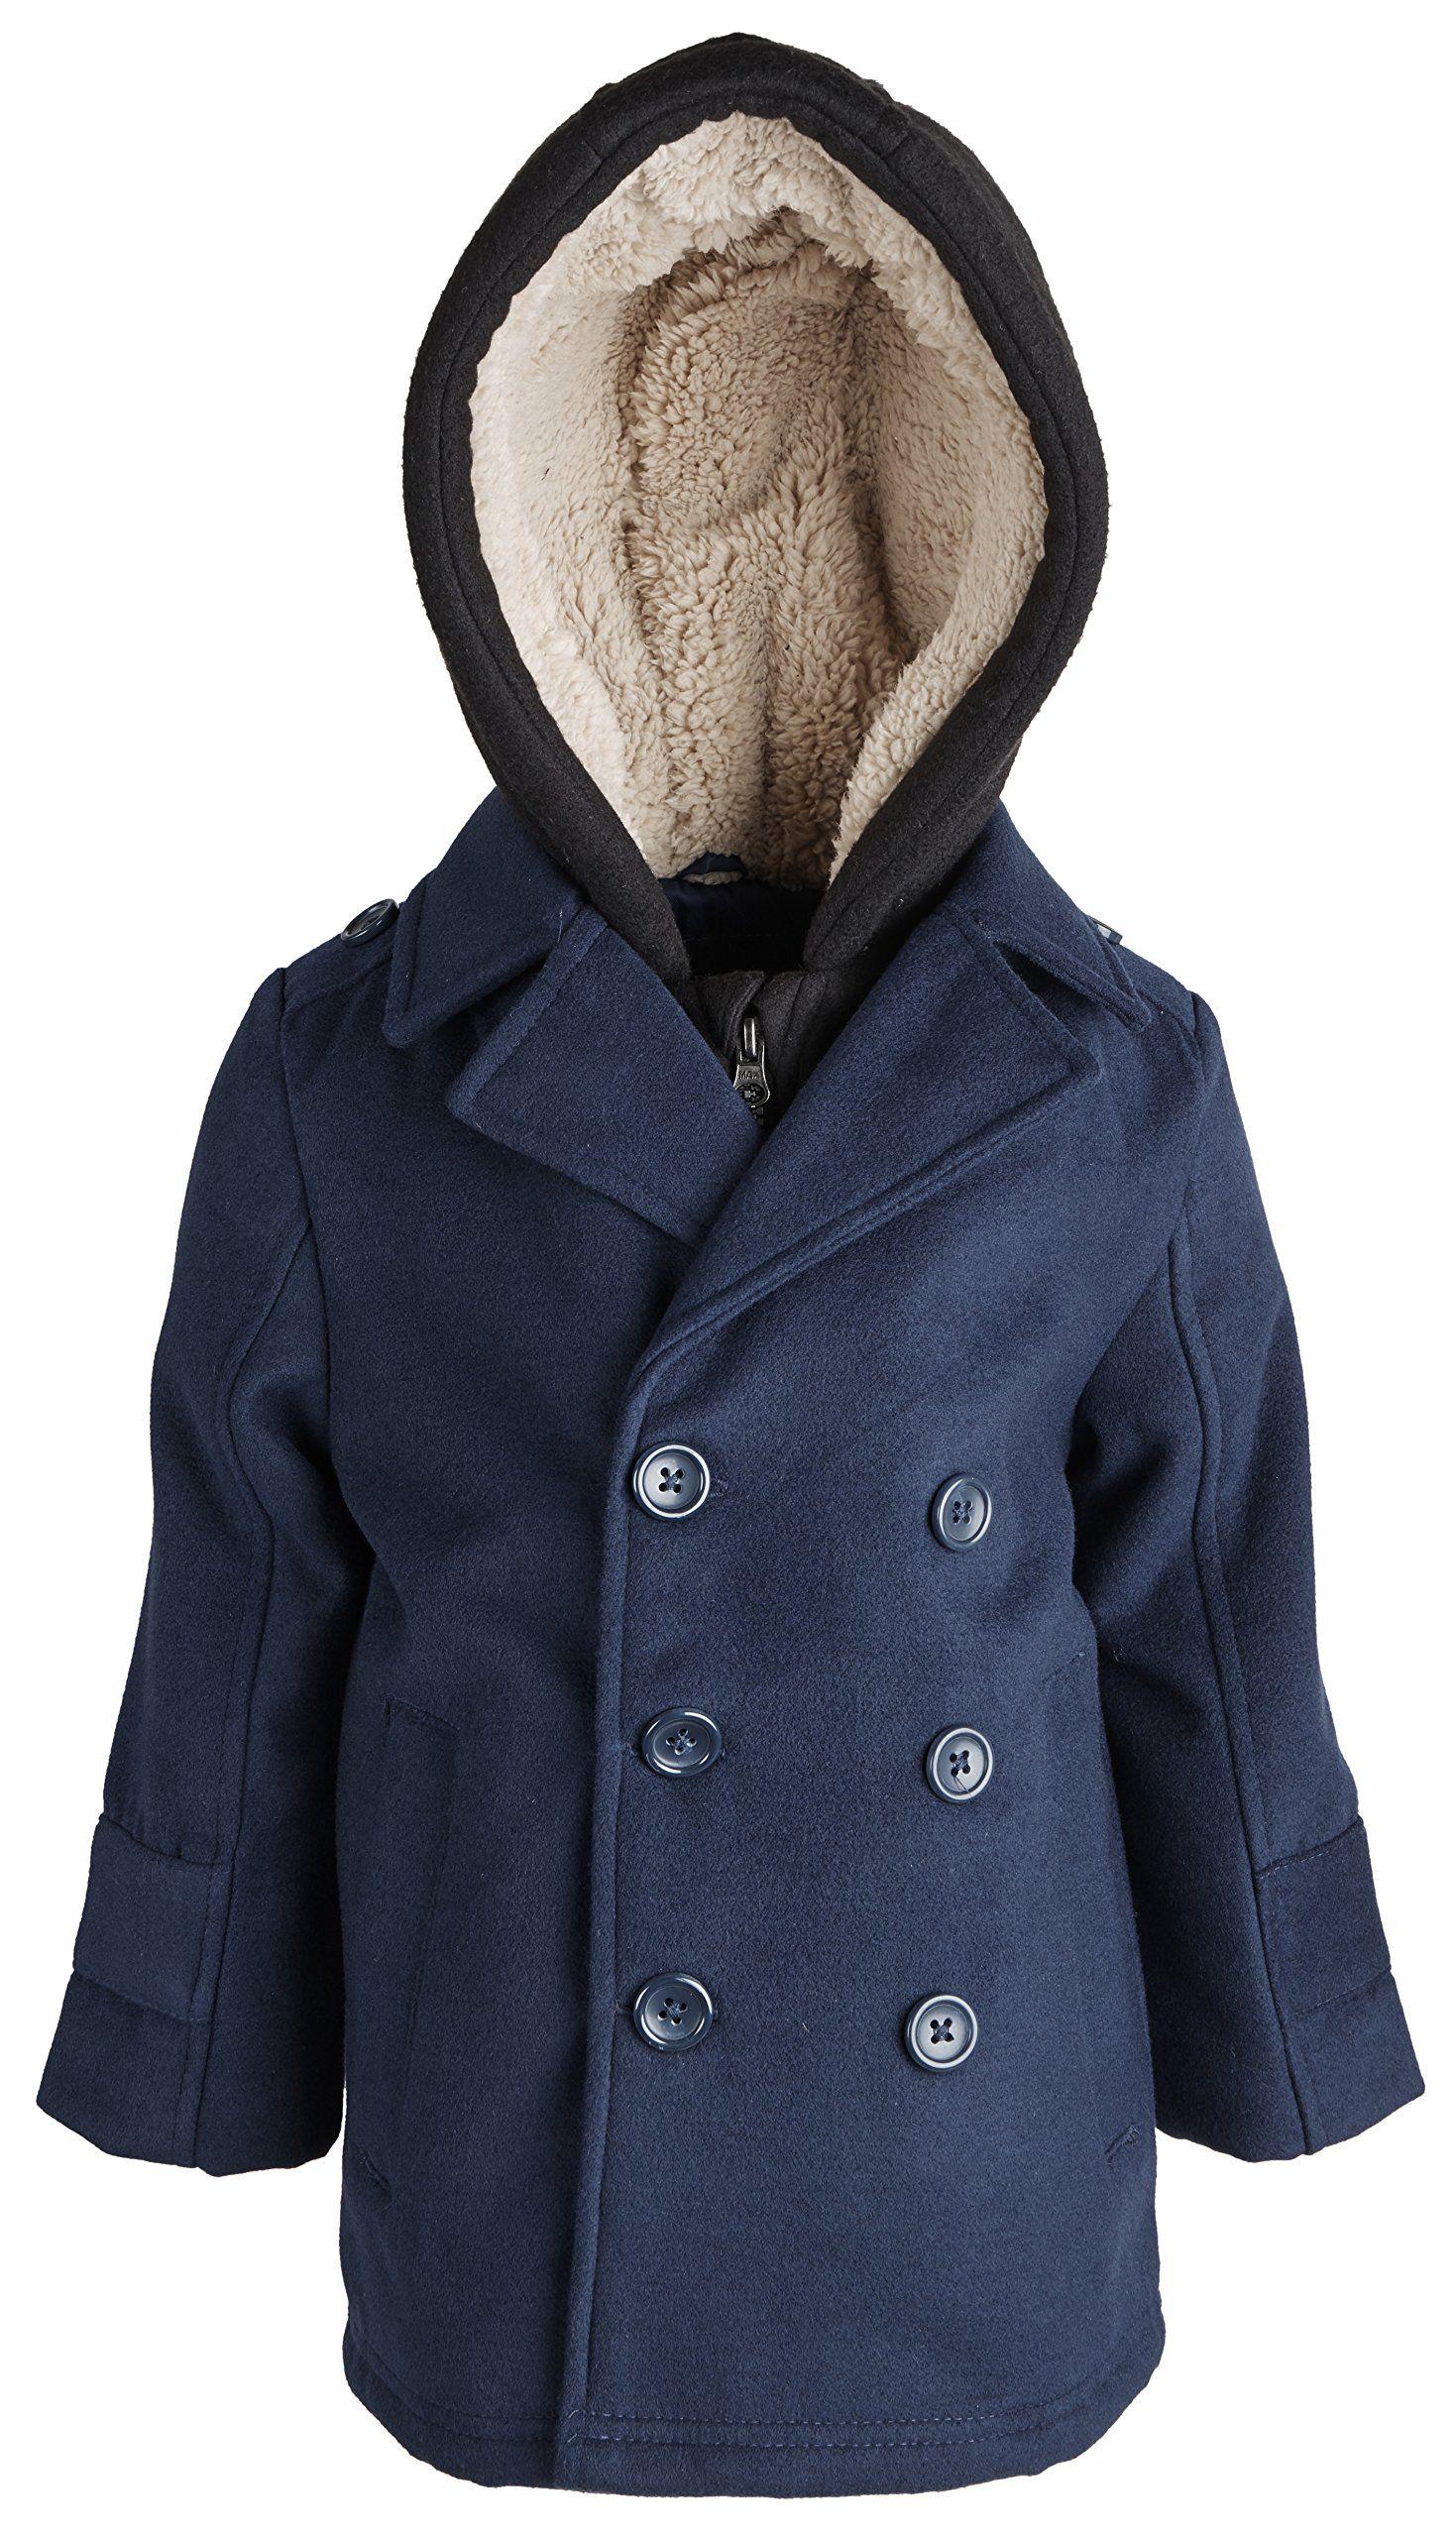 Londonfog Little Boys Double Breasted Wool Look Dressy Peacoat Jacket With Hood Navy Size 3t Hood Shell Contents 60 Peacoat Jacket Hooded Jacket Peacoat [ 2560 x 1469 Pixel ]